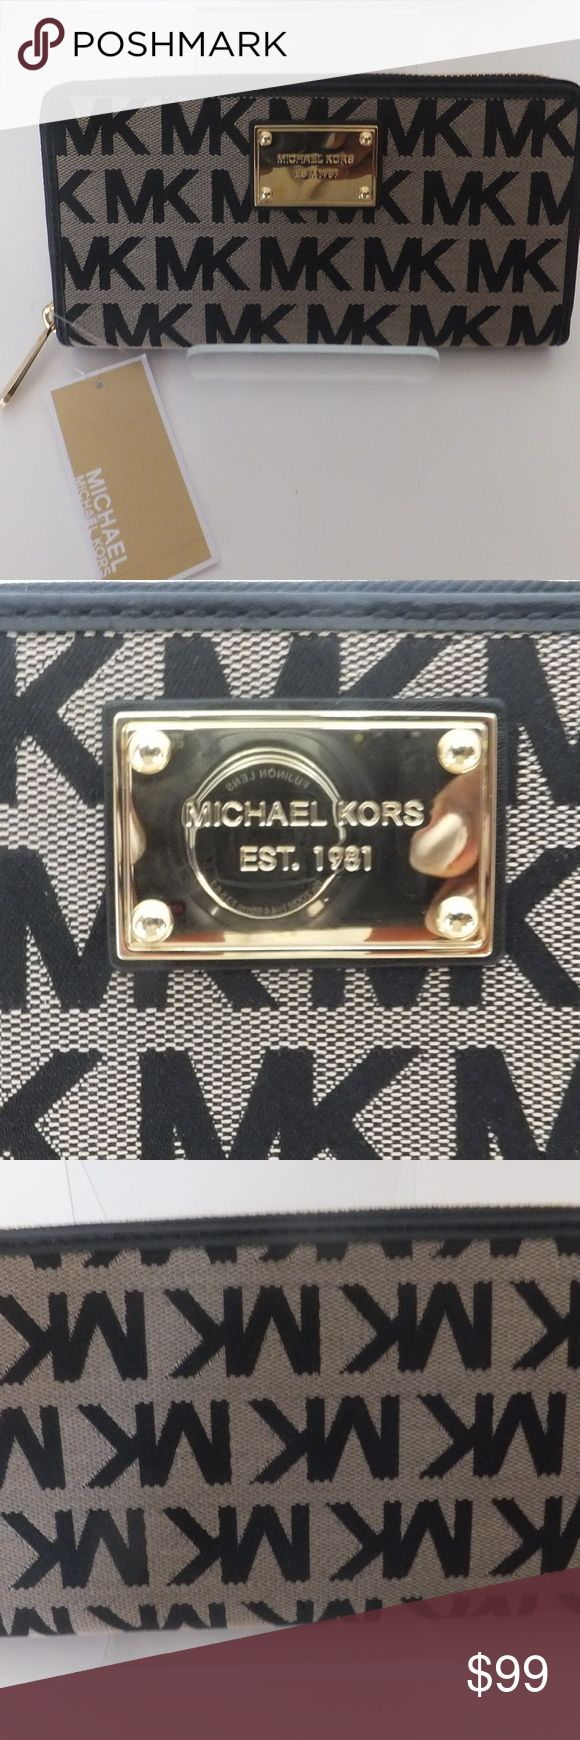 MK CONTINENTAL MONOGRAM WALLET LG CONTINENTAL MONOGRAM WALLET LG Michael Kors Bags Wallets